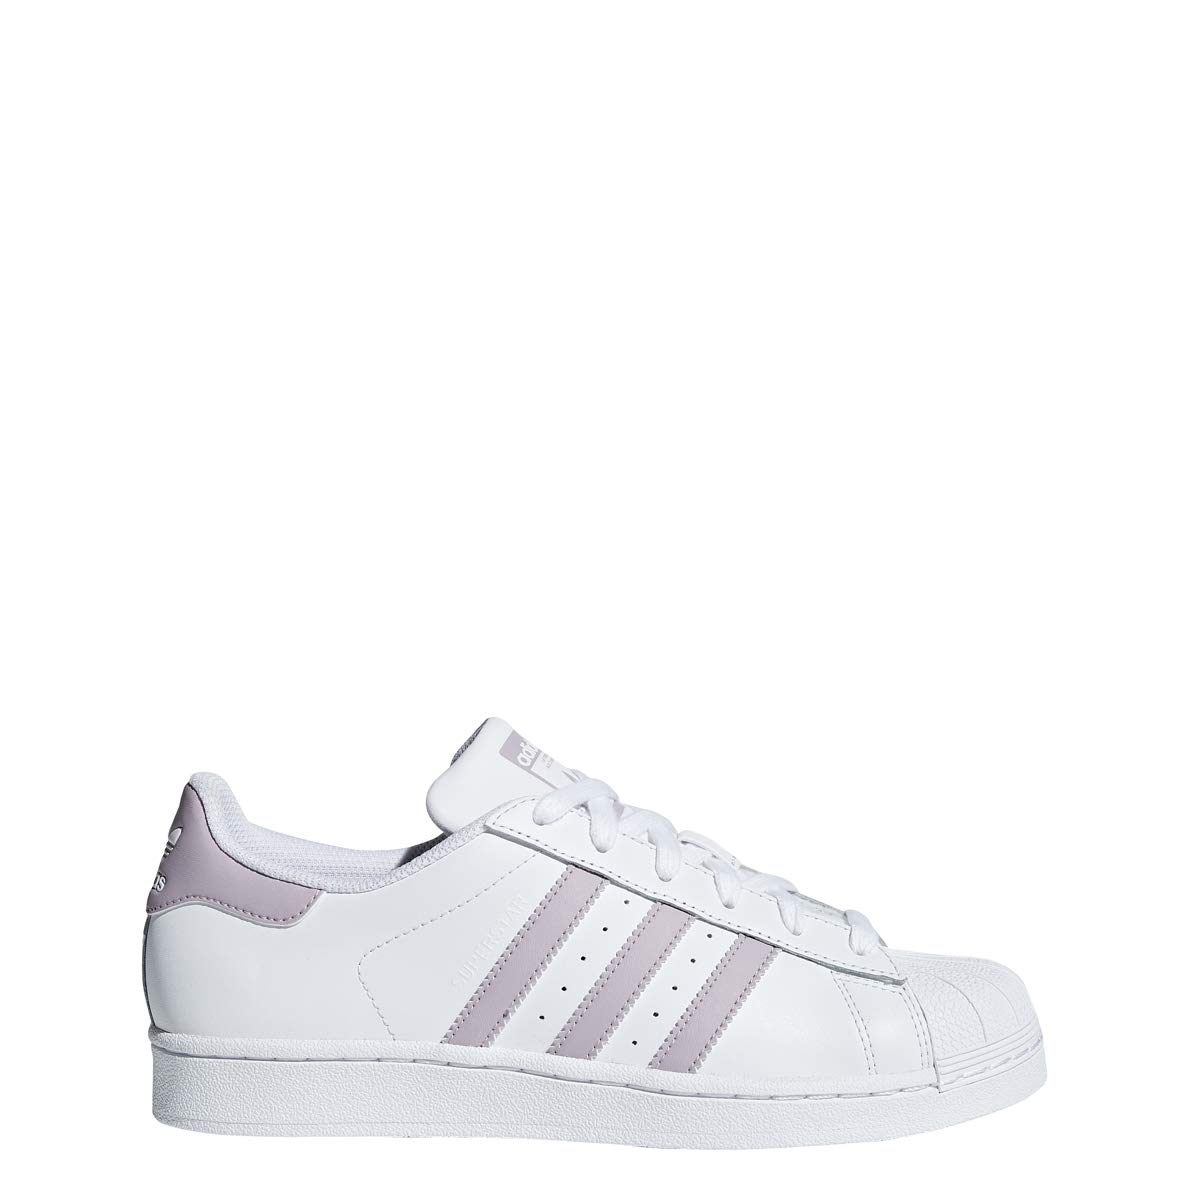 5ed2cc98e7055 Galleon - Adidas Originals Women s Superstar Shoes Running